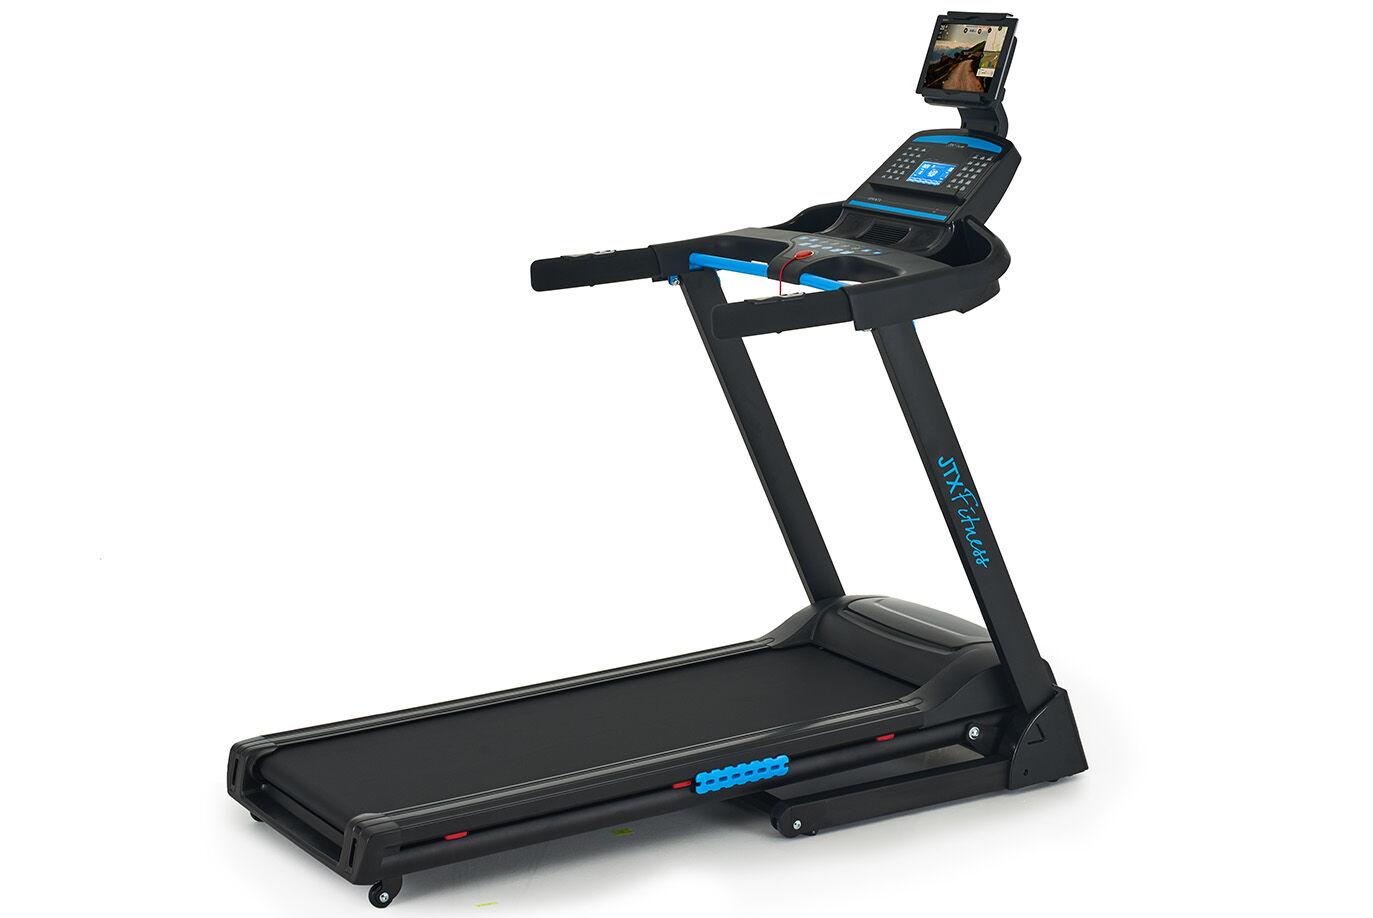 Smallest Treadmill from JTX Fitness